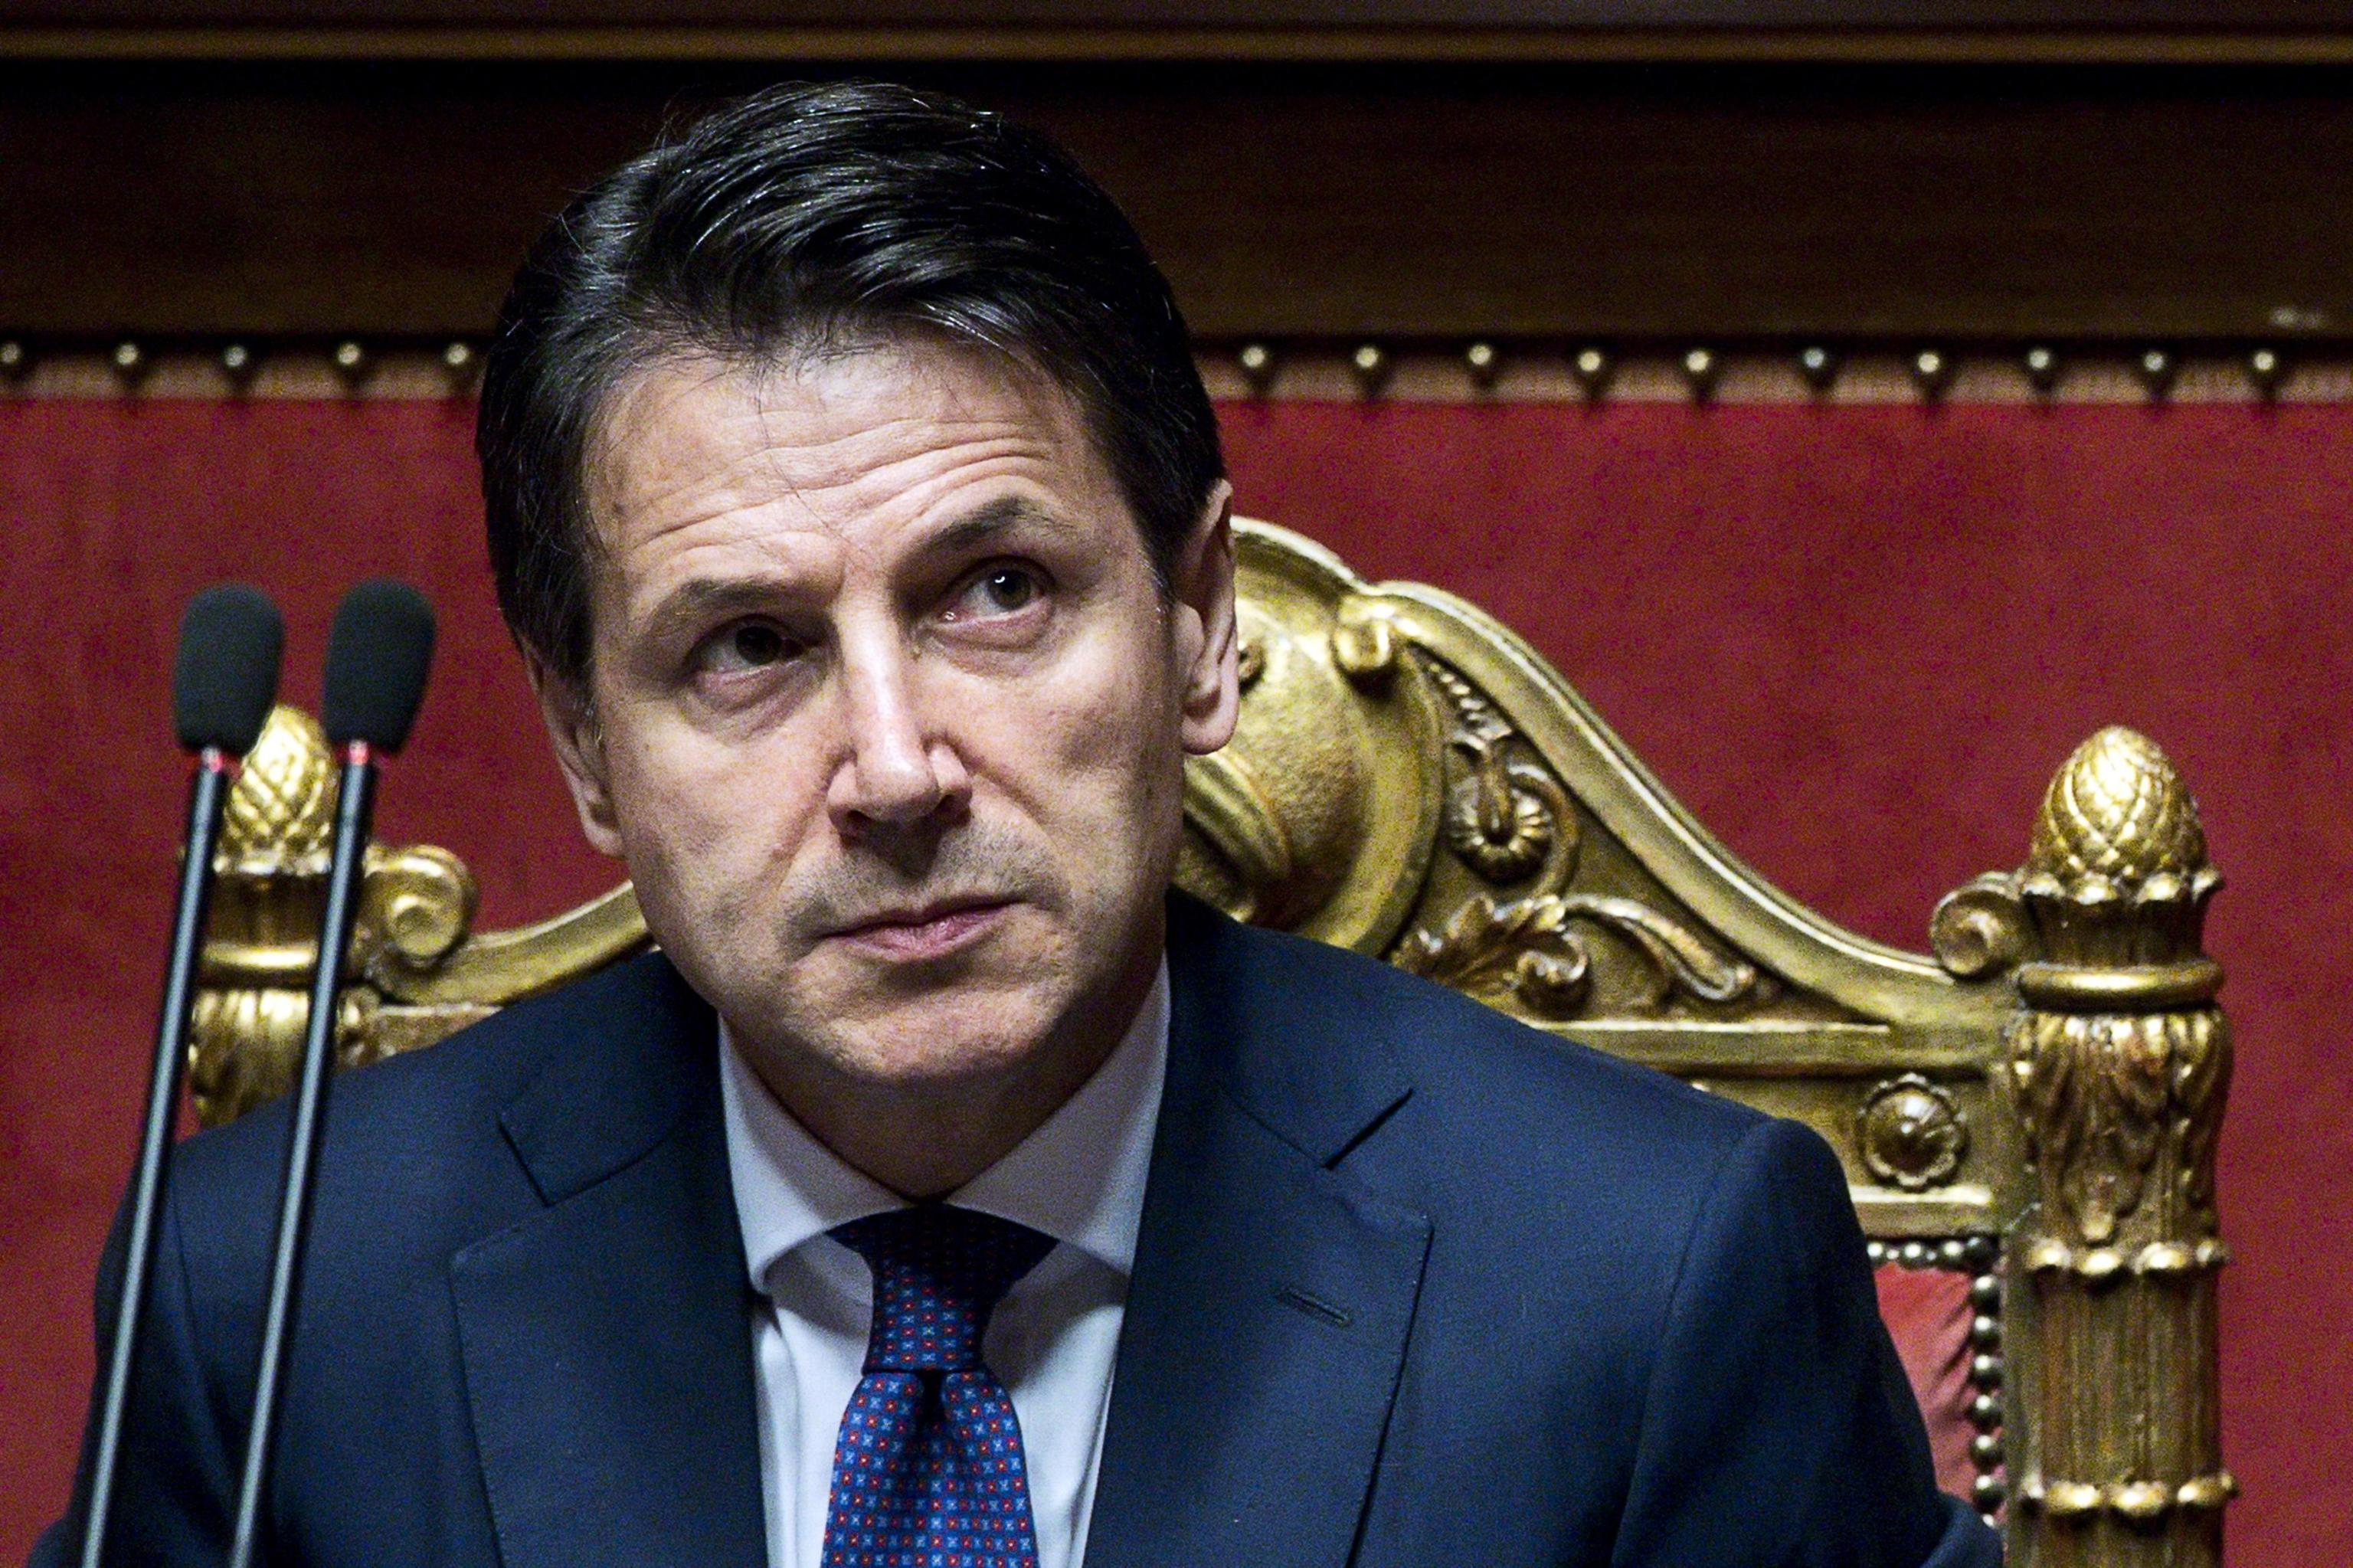 Giuseppe Conte fidanzato con Olivia Paladino?